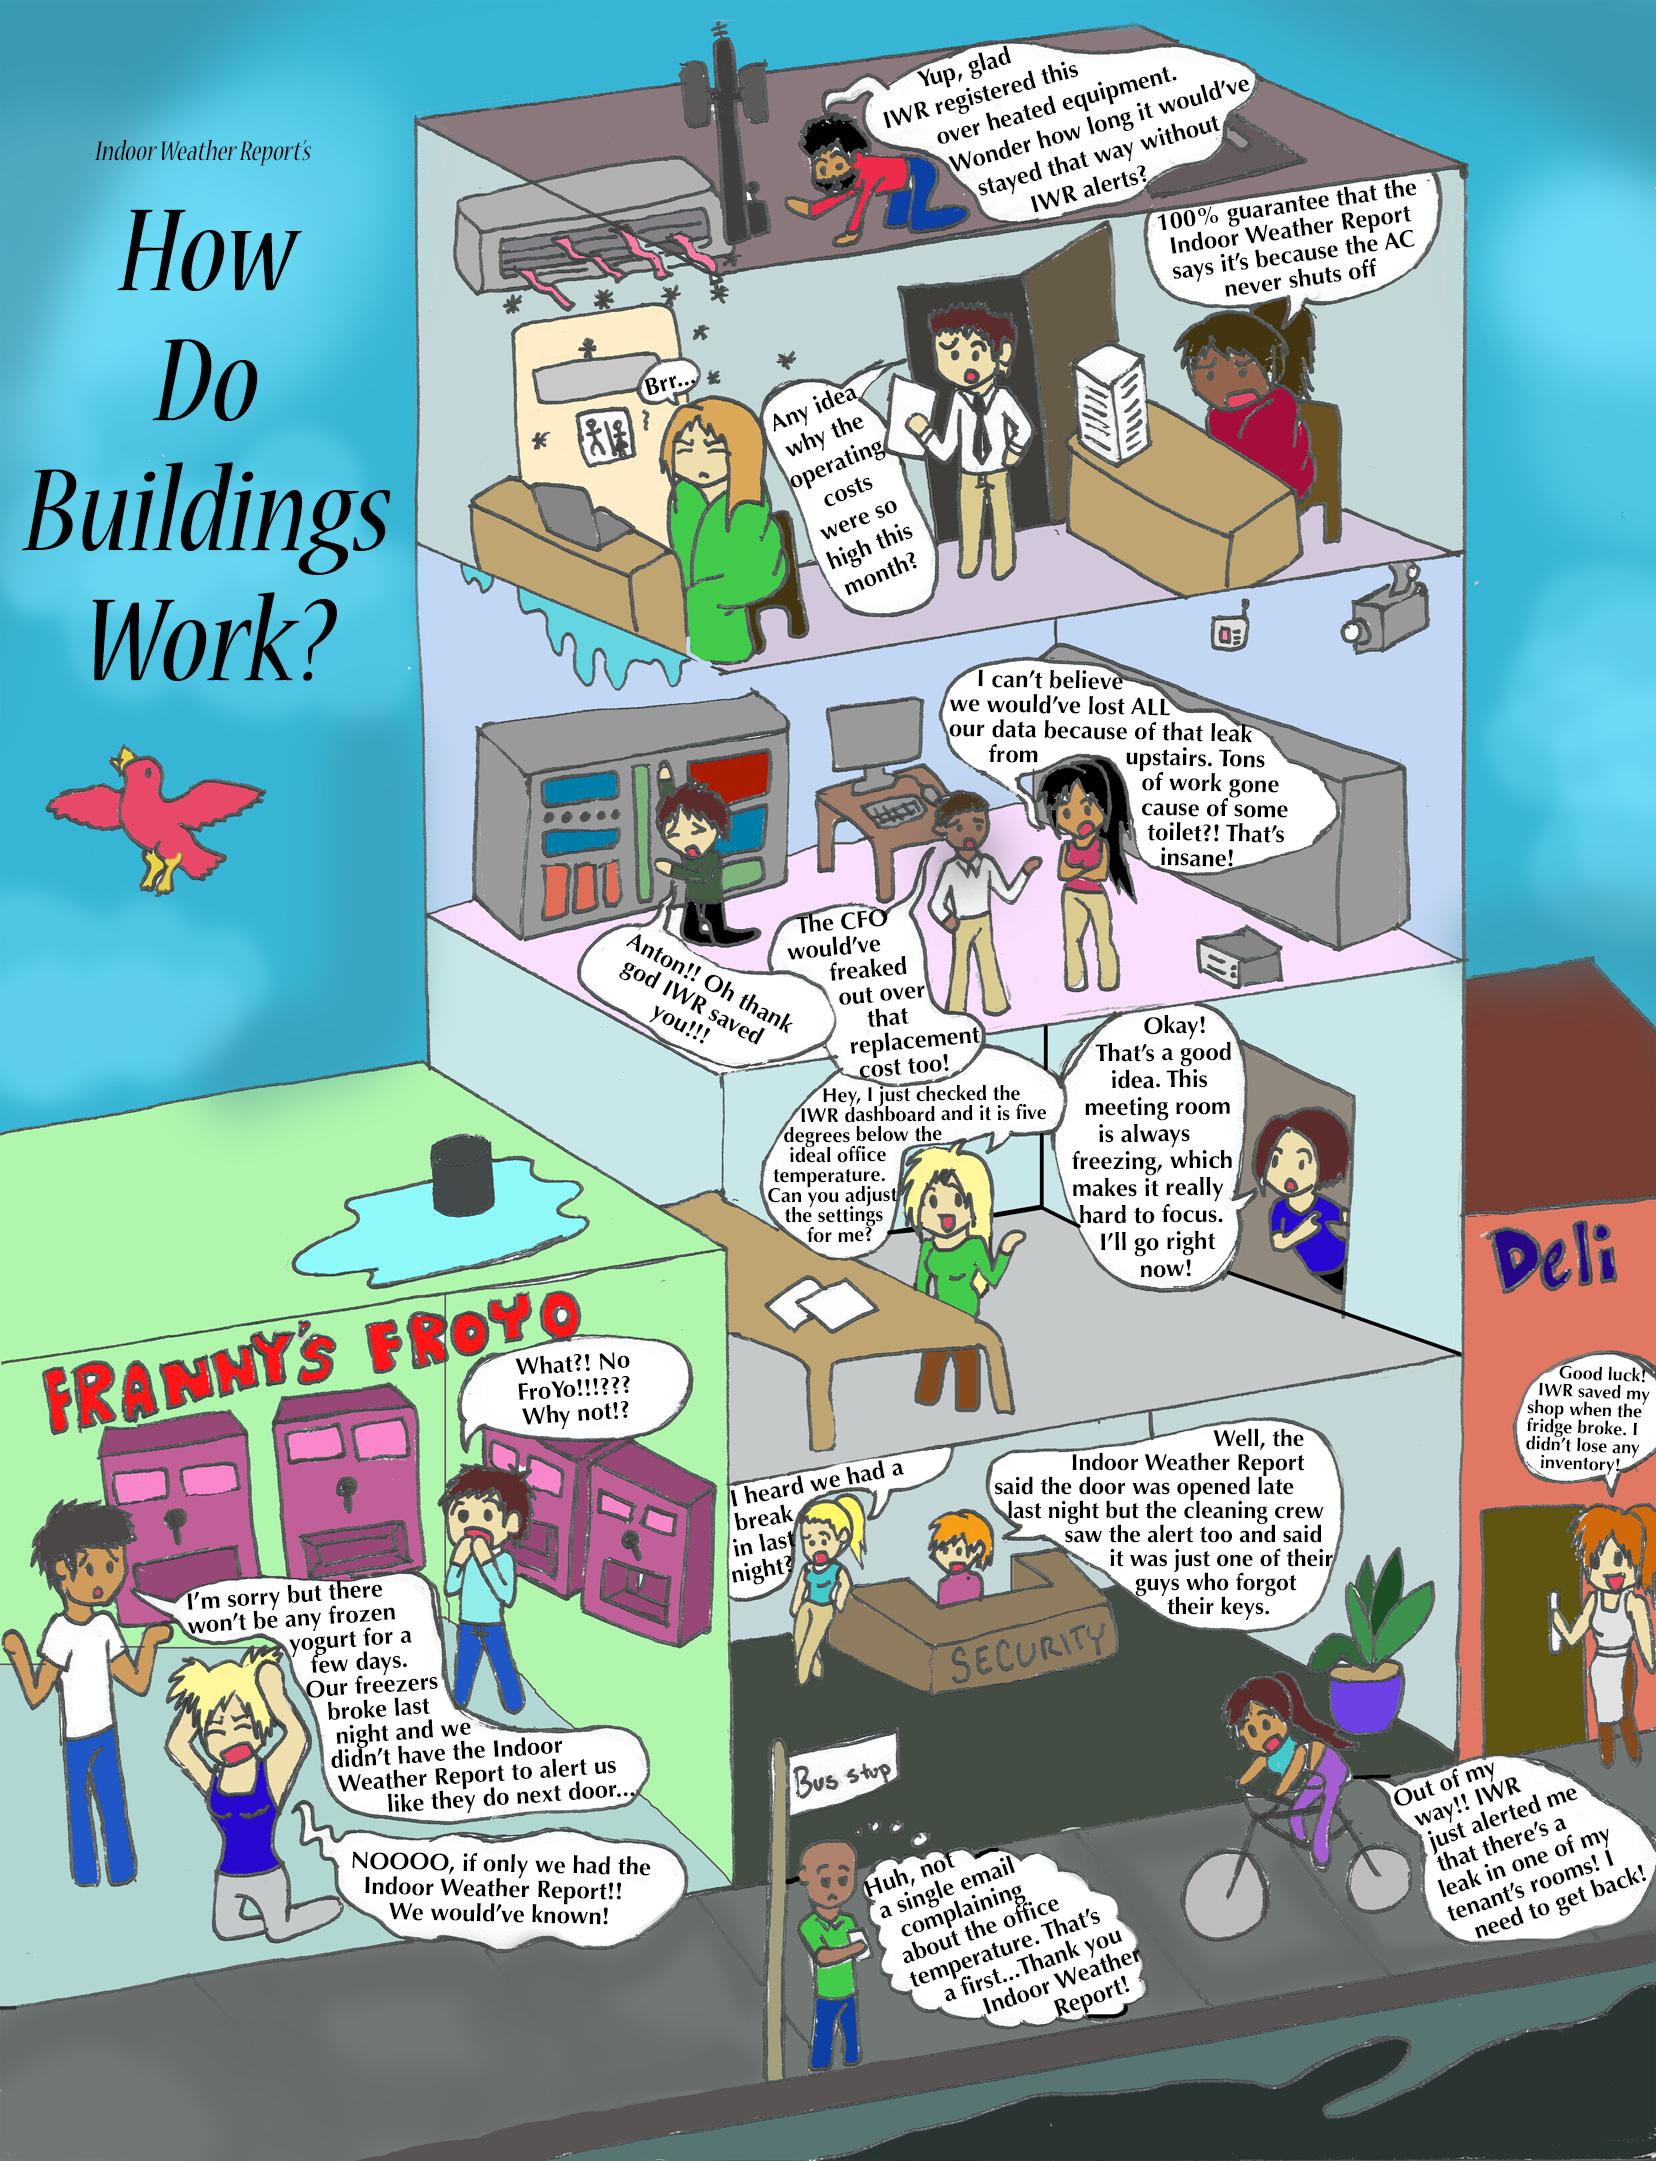 IWR's Explanation Illustration